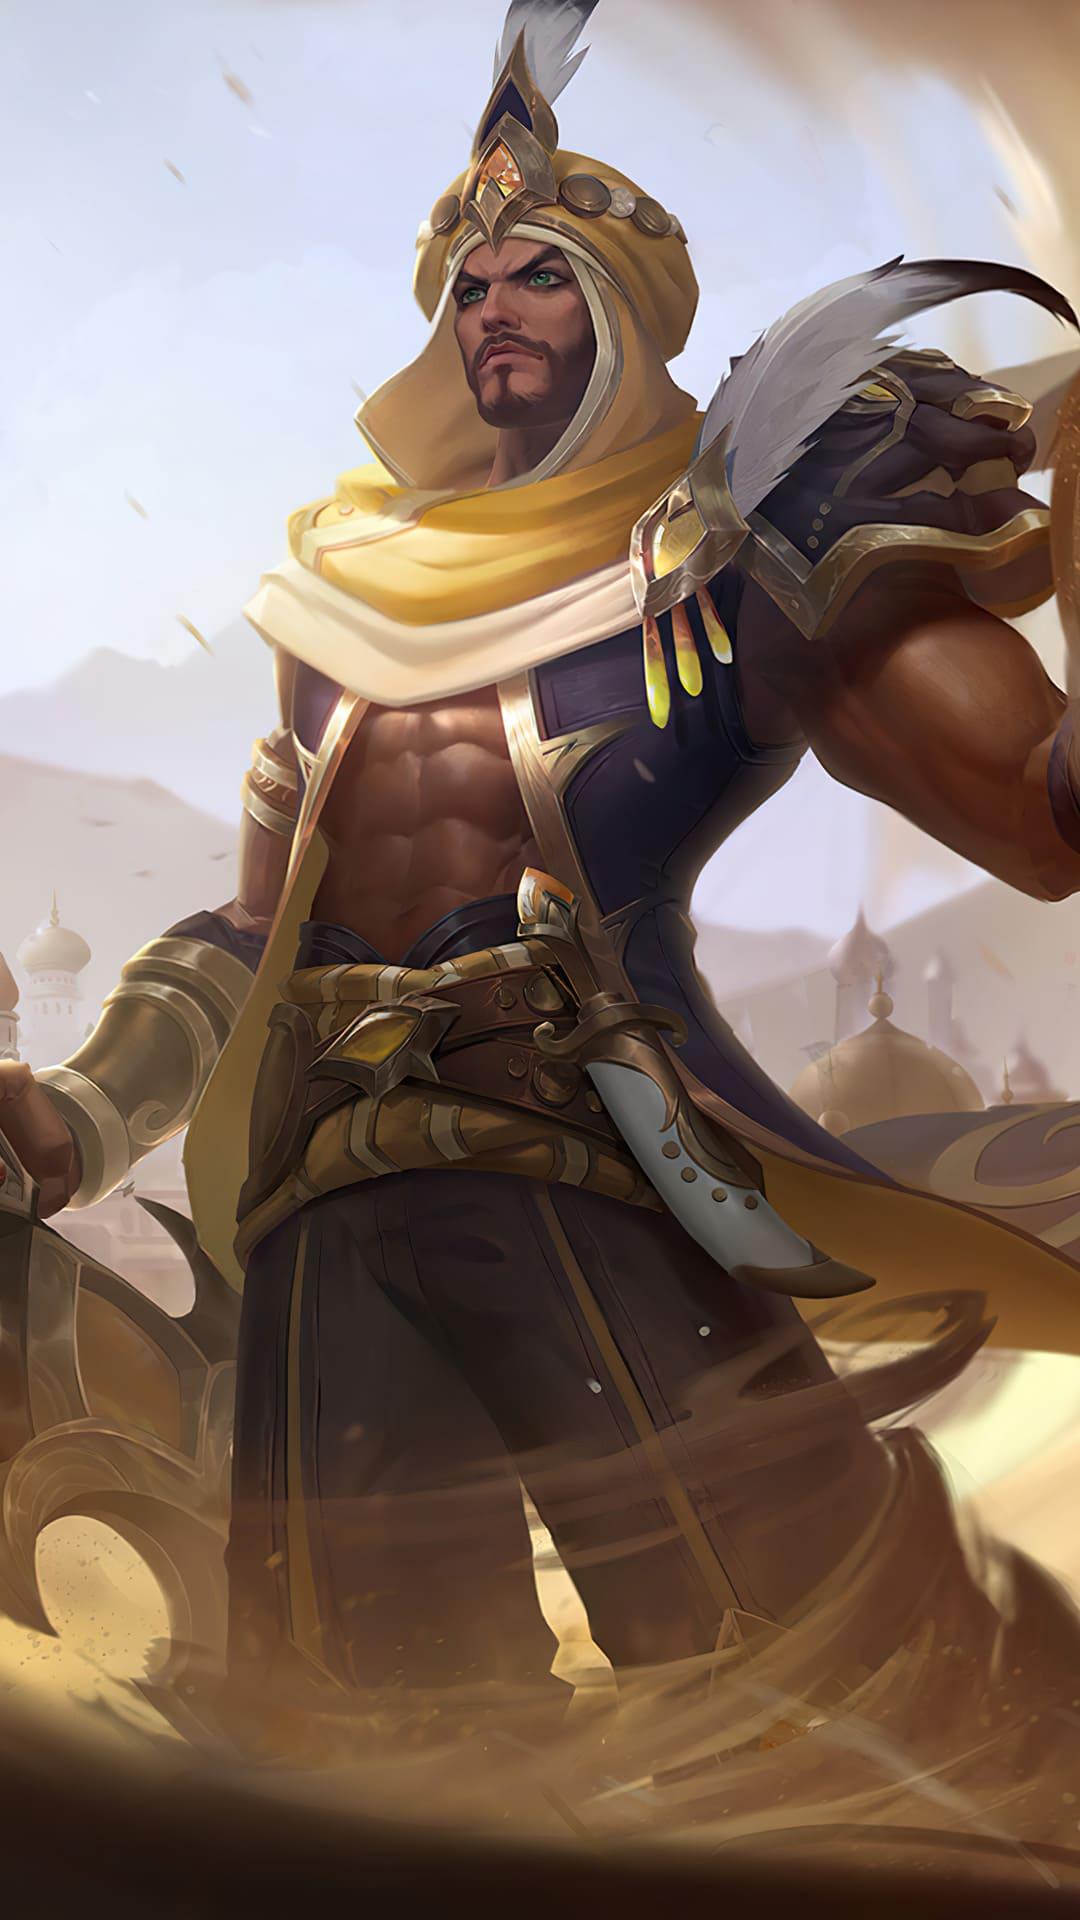 Khaleed prince of sand skin mobile legends hd for mobile hobigame